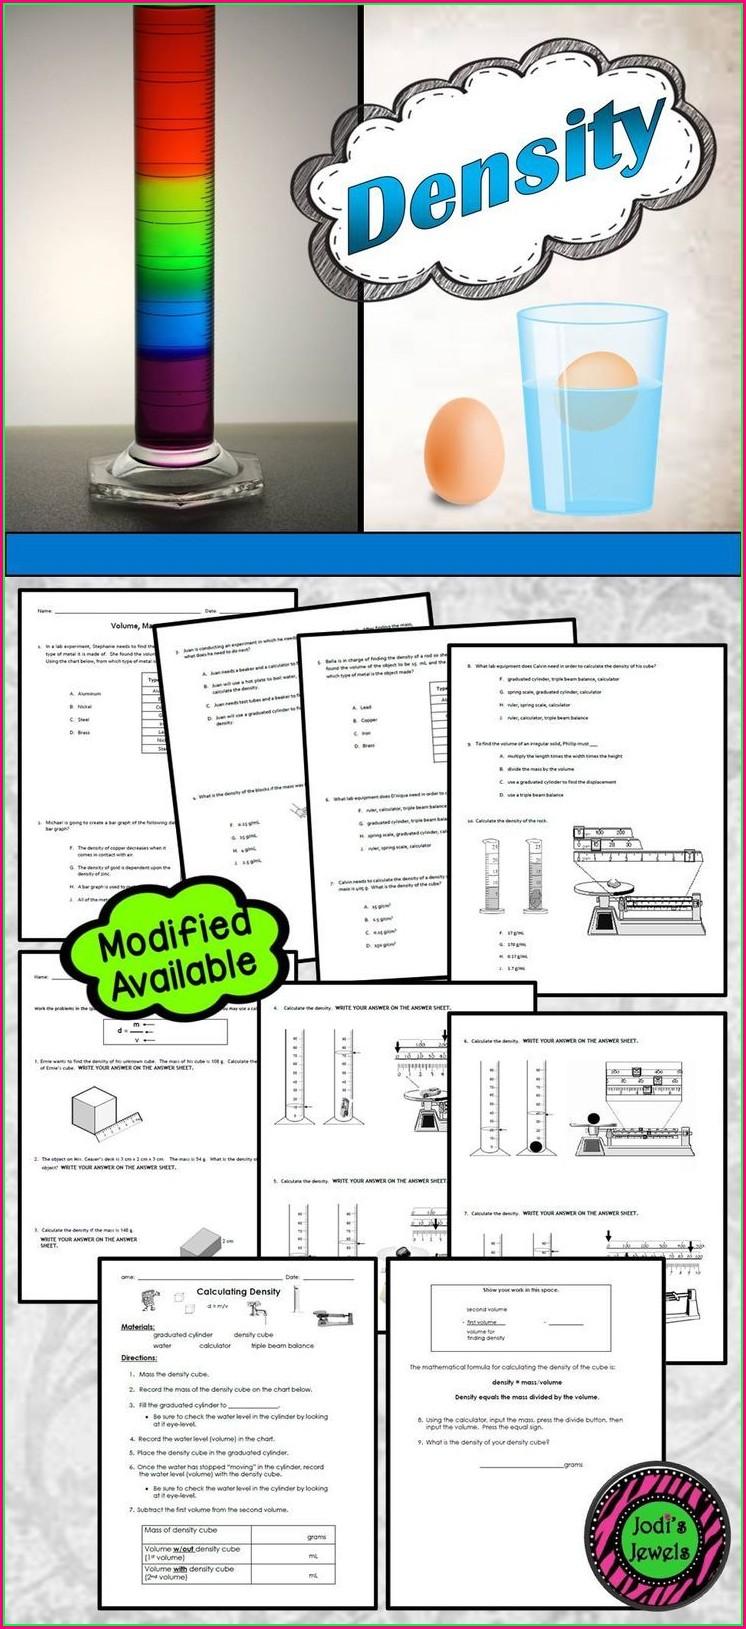 Middle School Calculating Density Worksheet